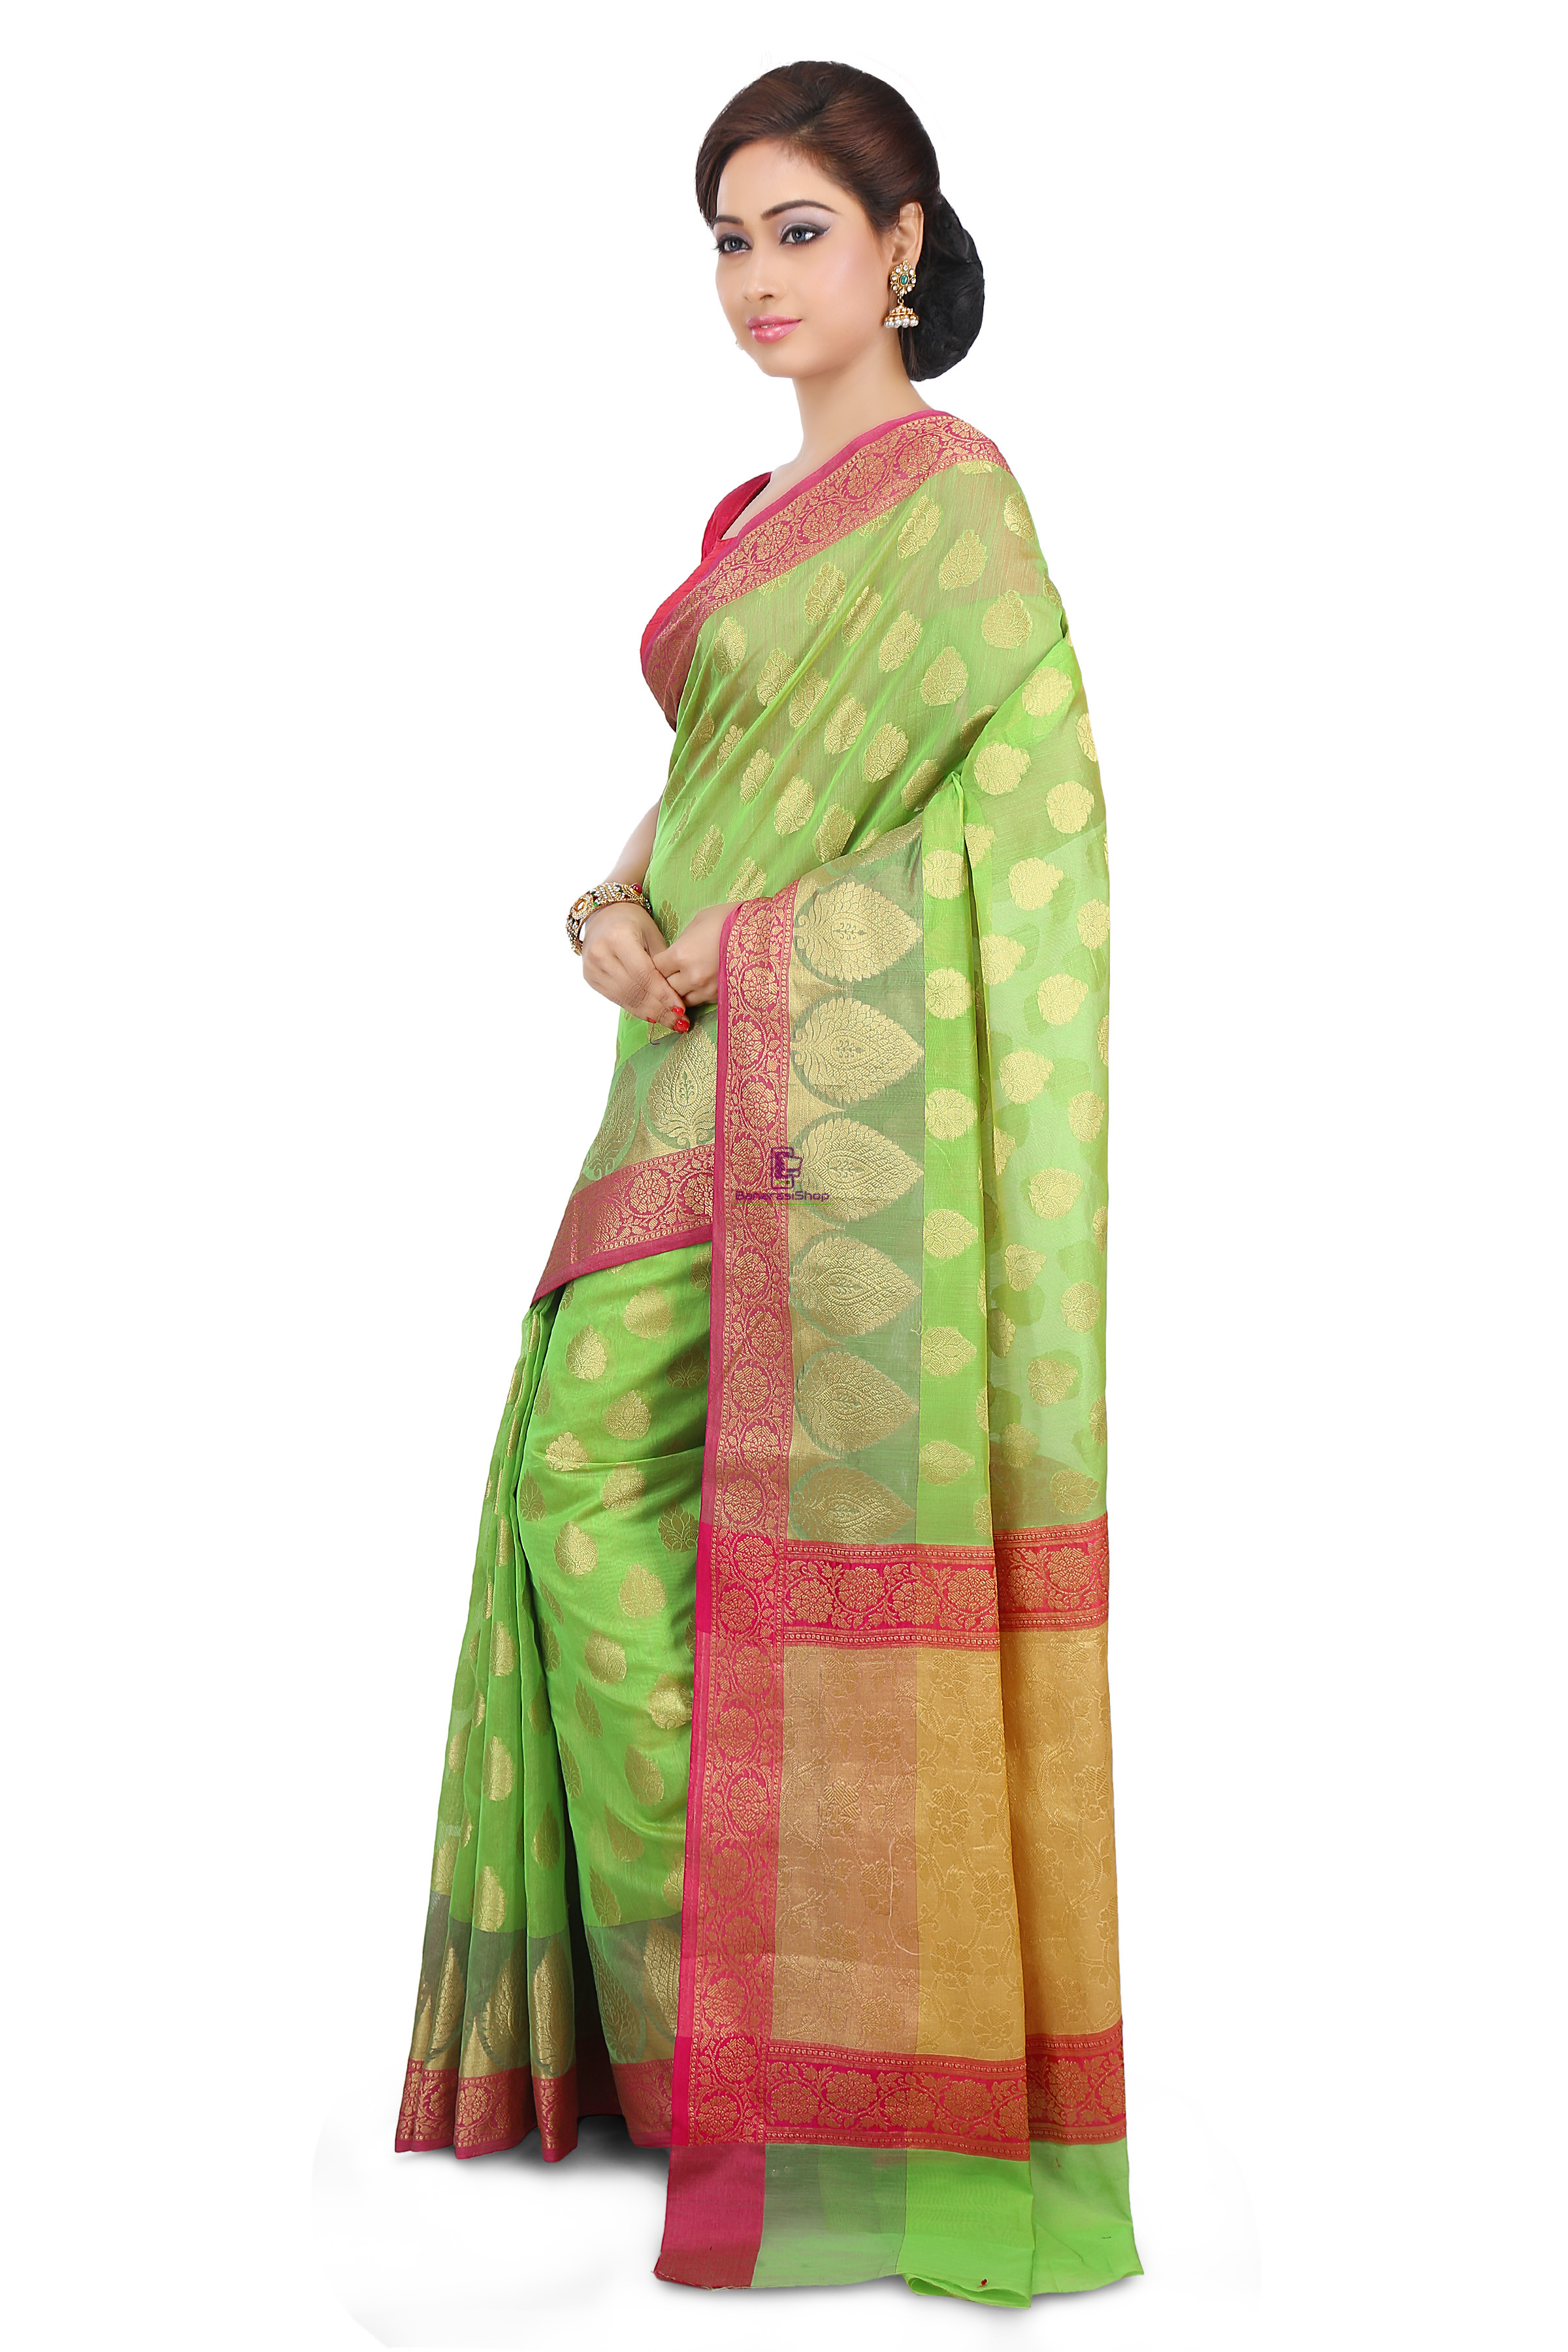 Woven Banarasi Cotton Silk Saree in Light Green 5